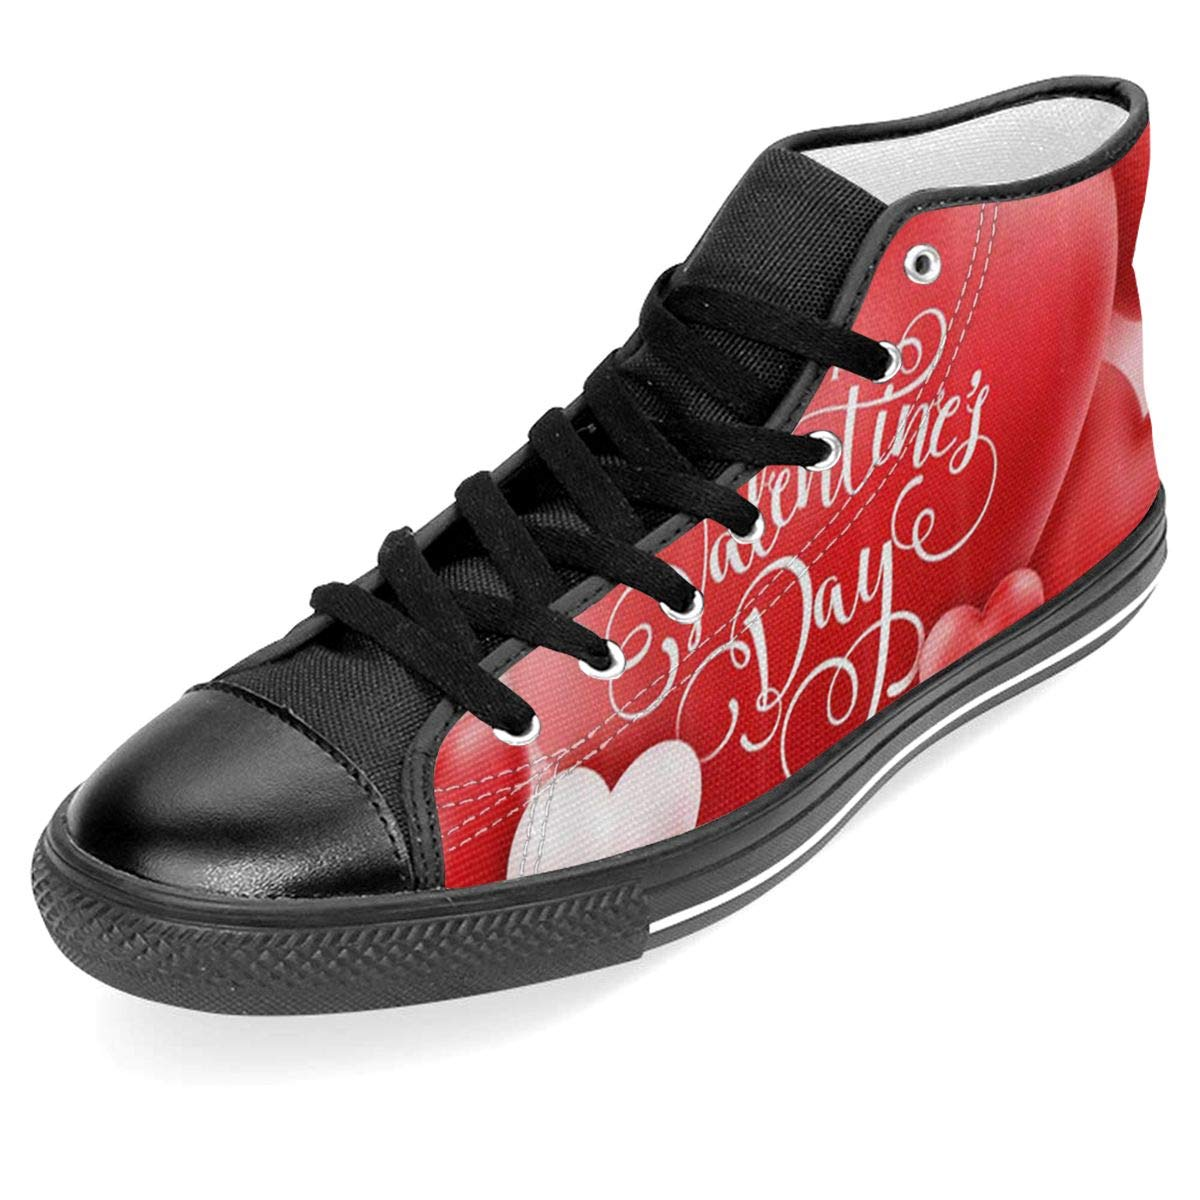 JIFHS Romantic Heart Shaped Balloon Womens Casual High Top Canvas Shoes